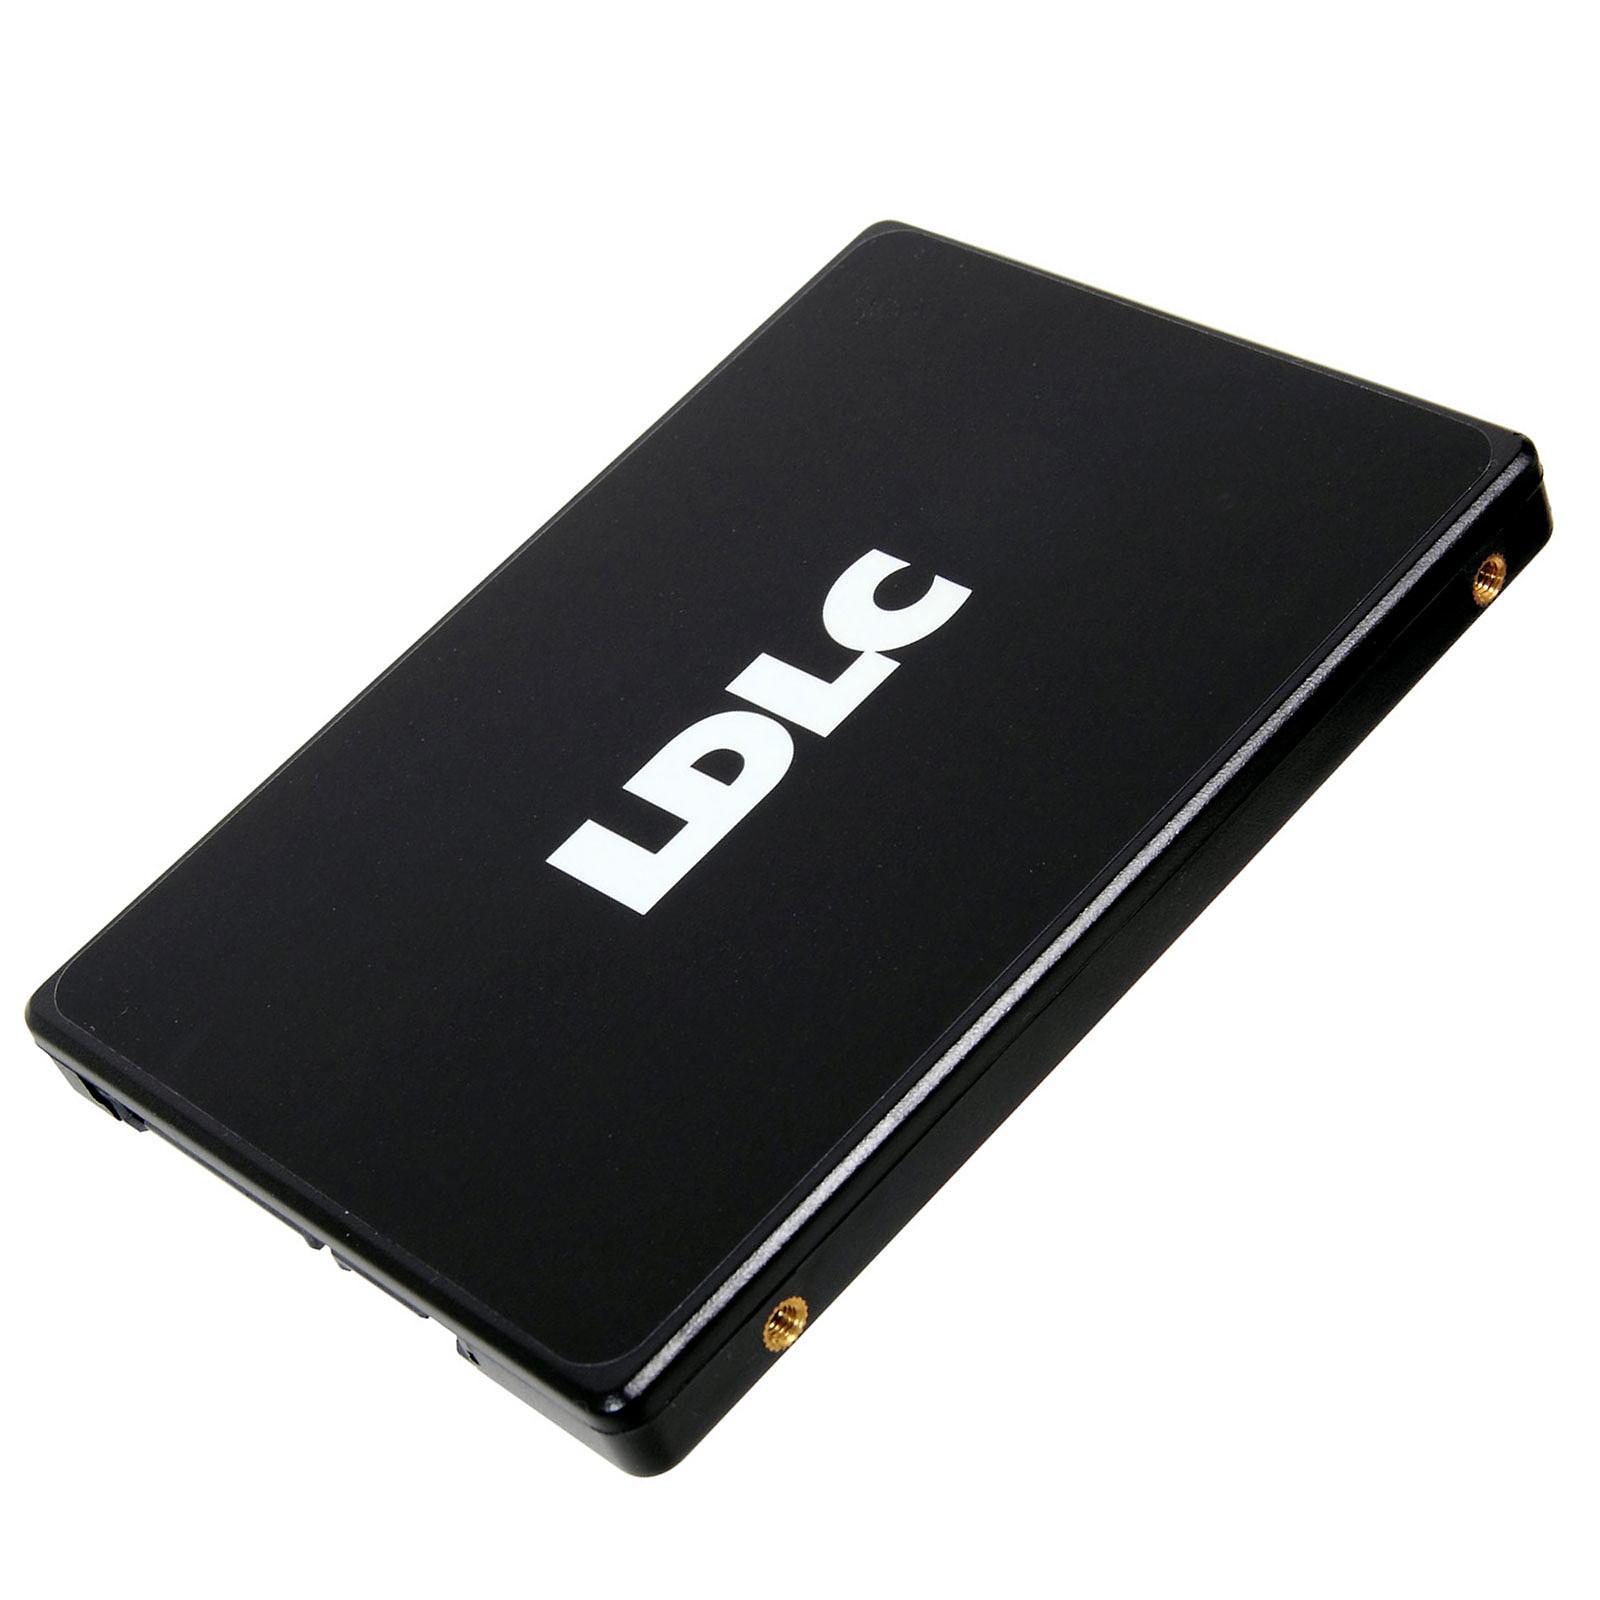 LDLC SSD F7 PLUS 3D NAND 480 GB